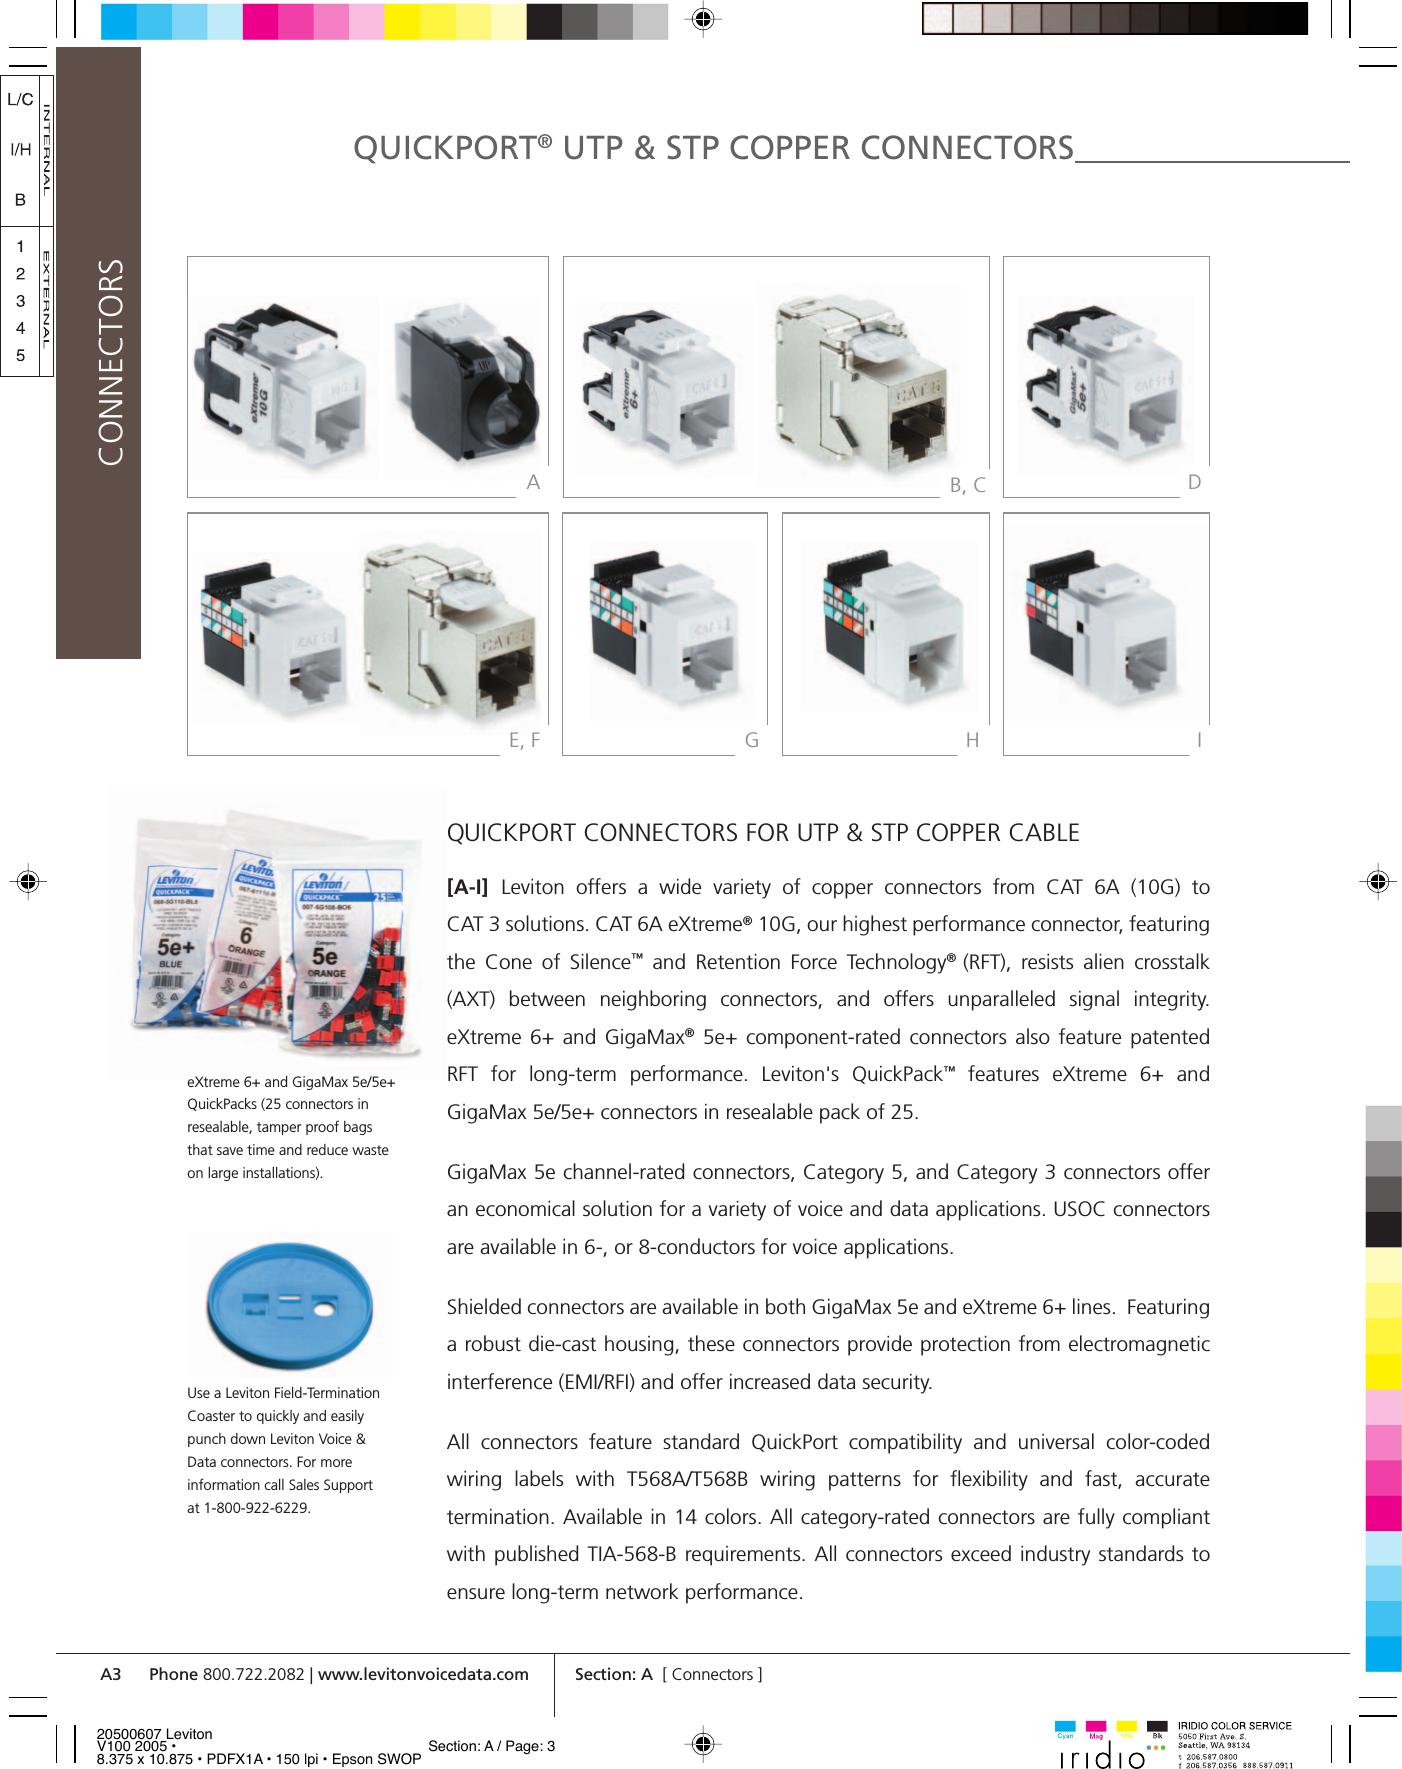 A 0607 Levdat B Brochure Eia Tia 568 Standard Pdf Page 3 Of 12